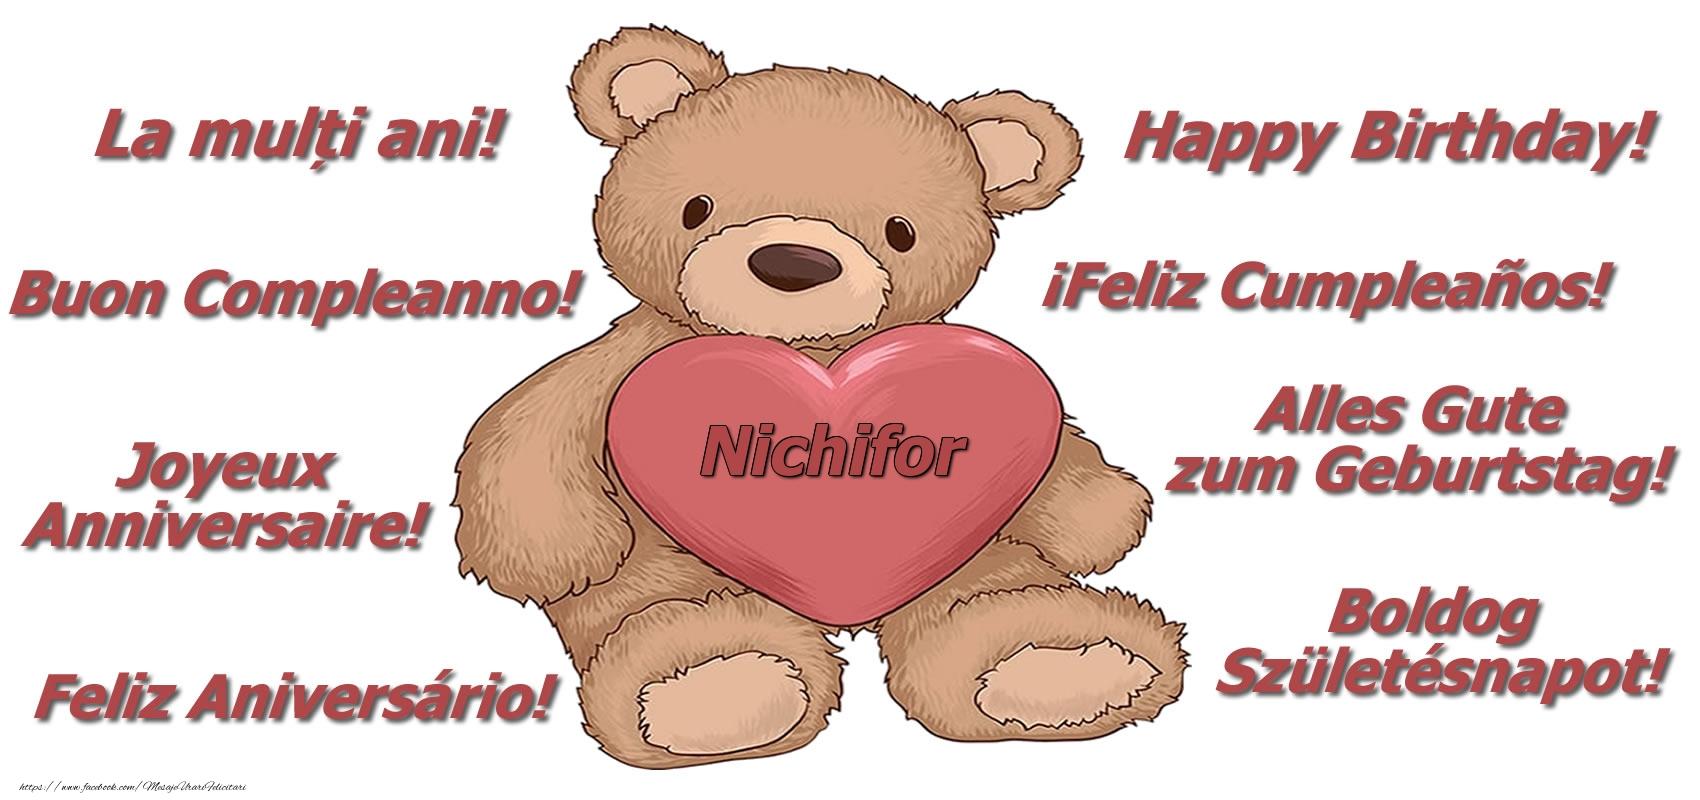 Felicitari de zi de nastere - La multi ani Nichifor! - Ursulet